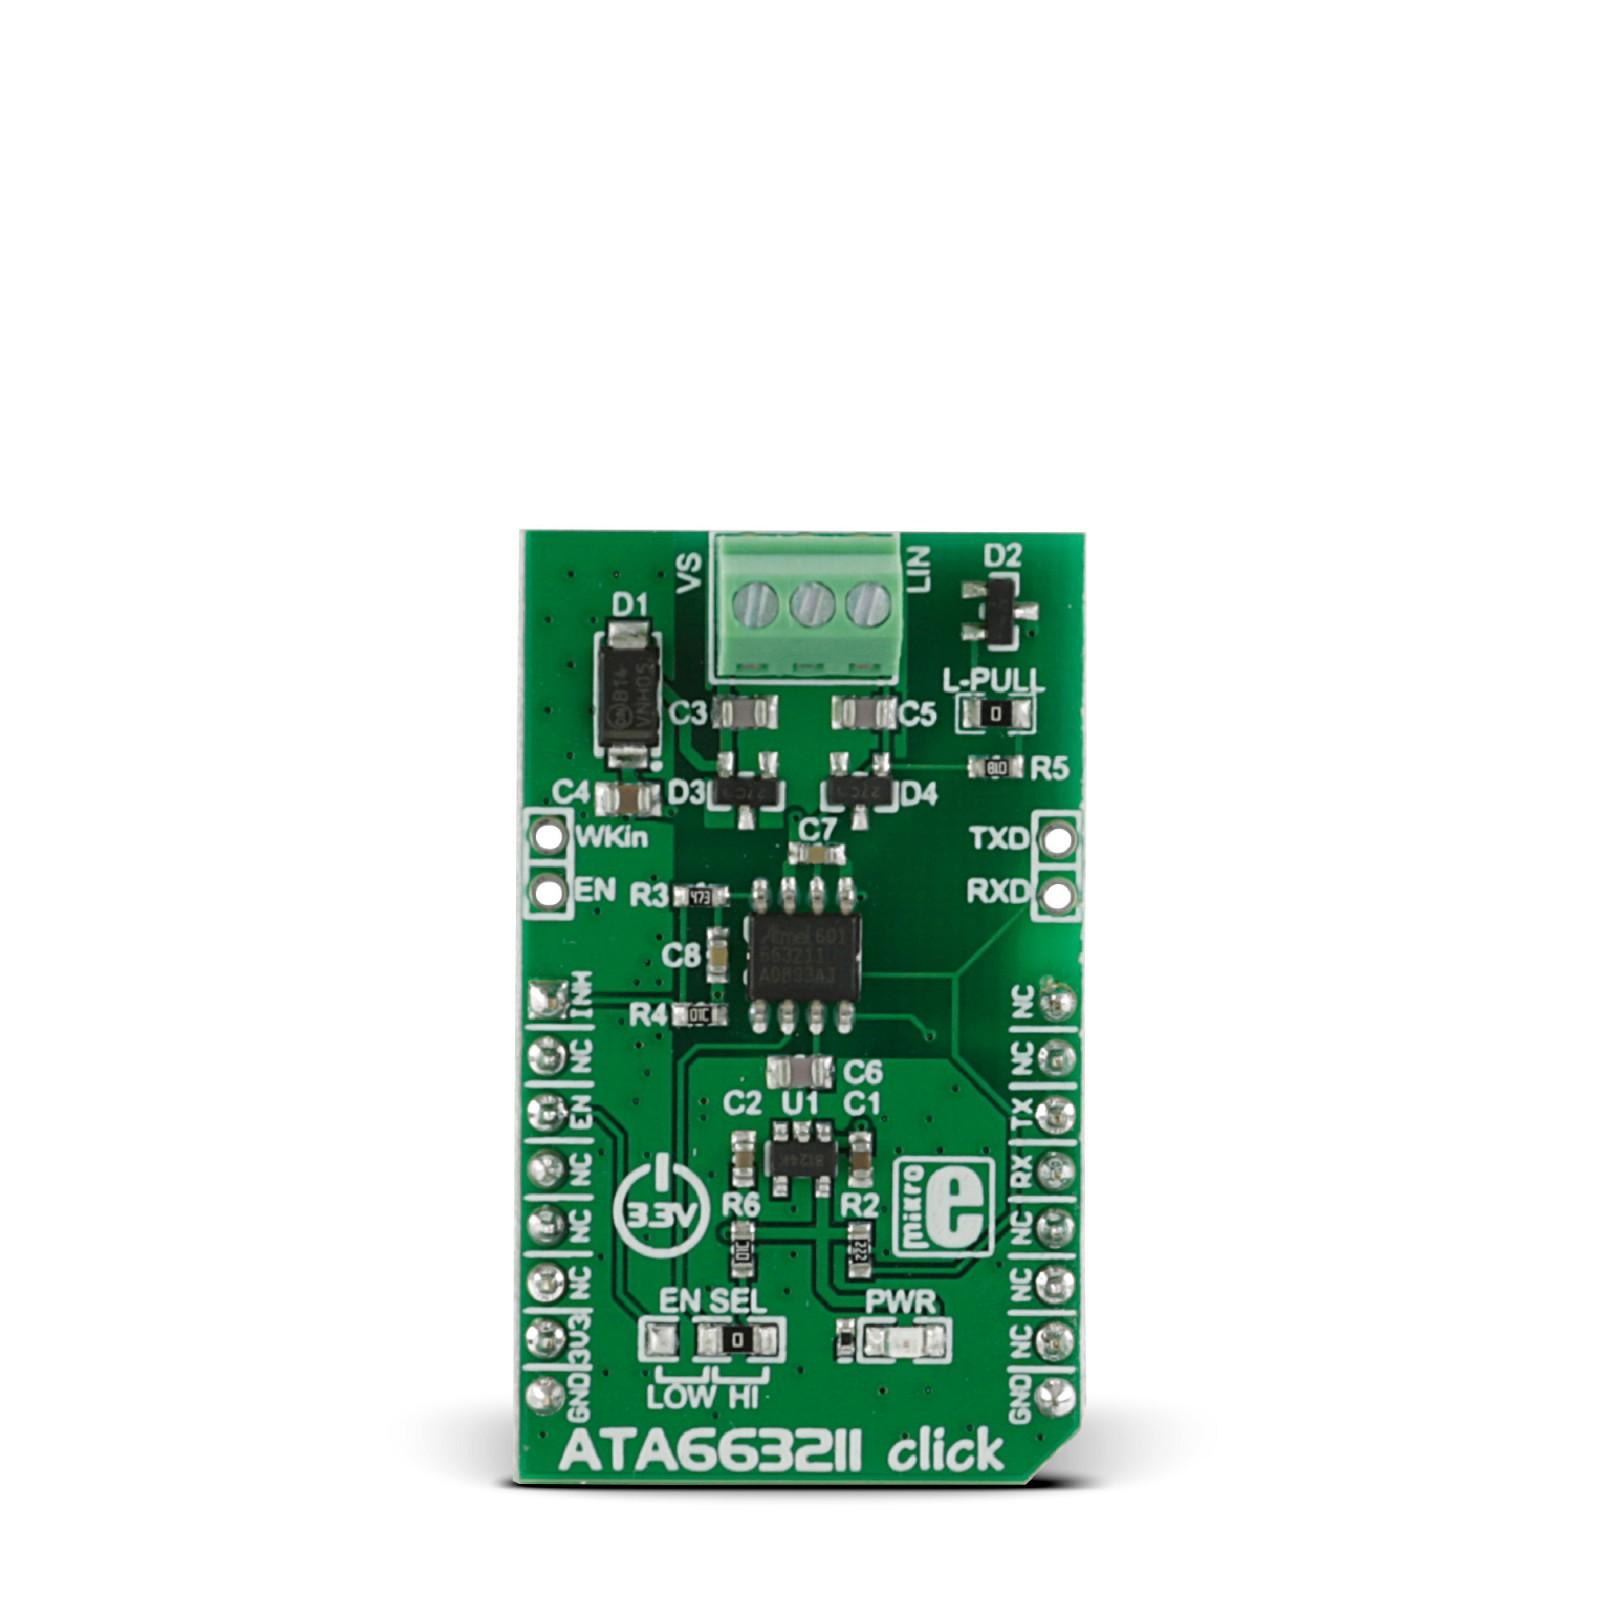 ATA663211 click — board with Atmel LIN transceiver | MikroElektronika